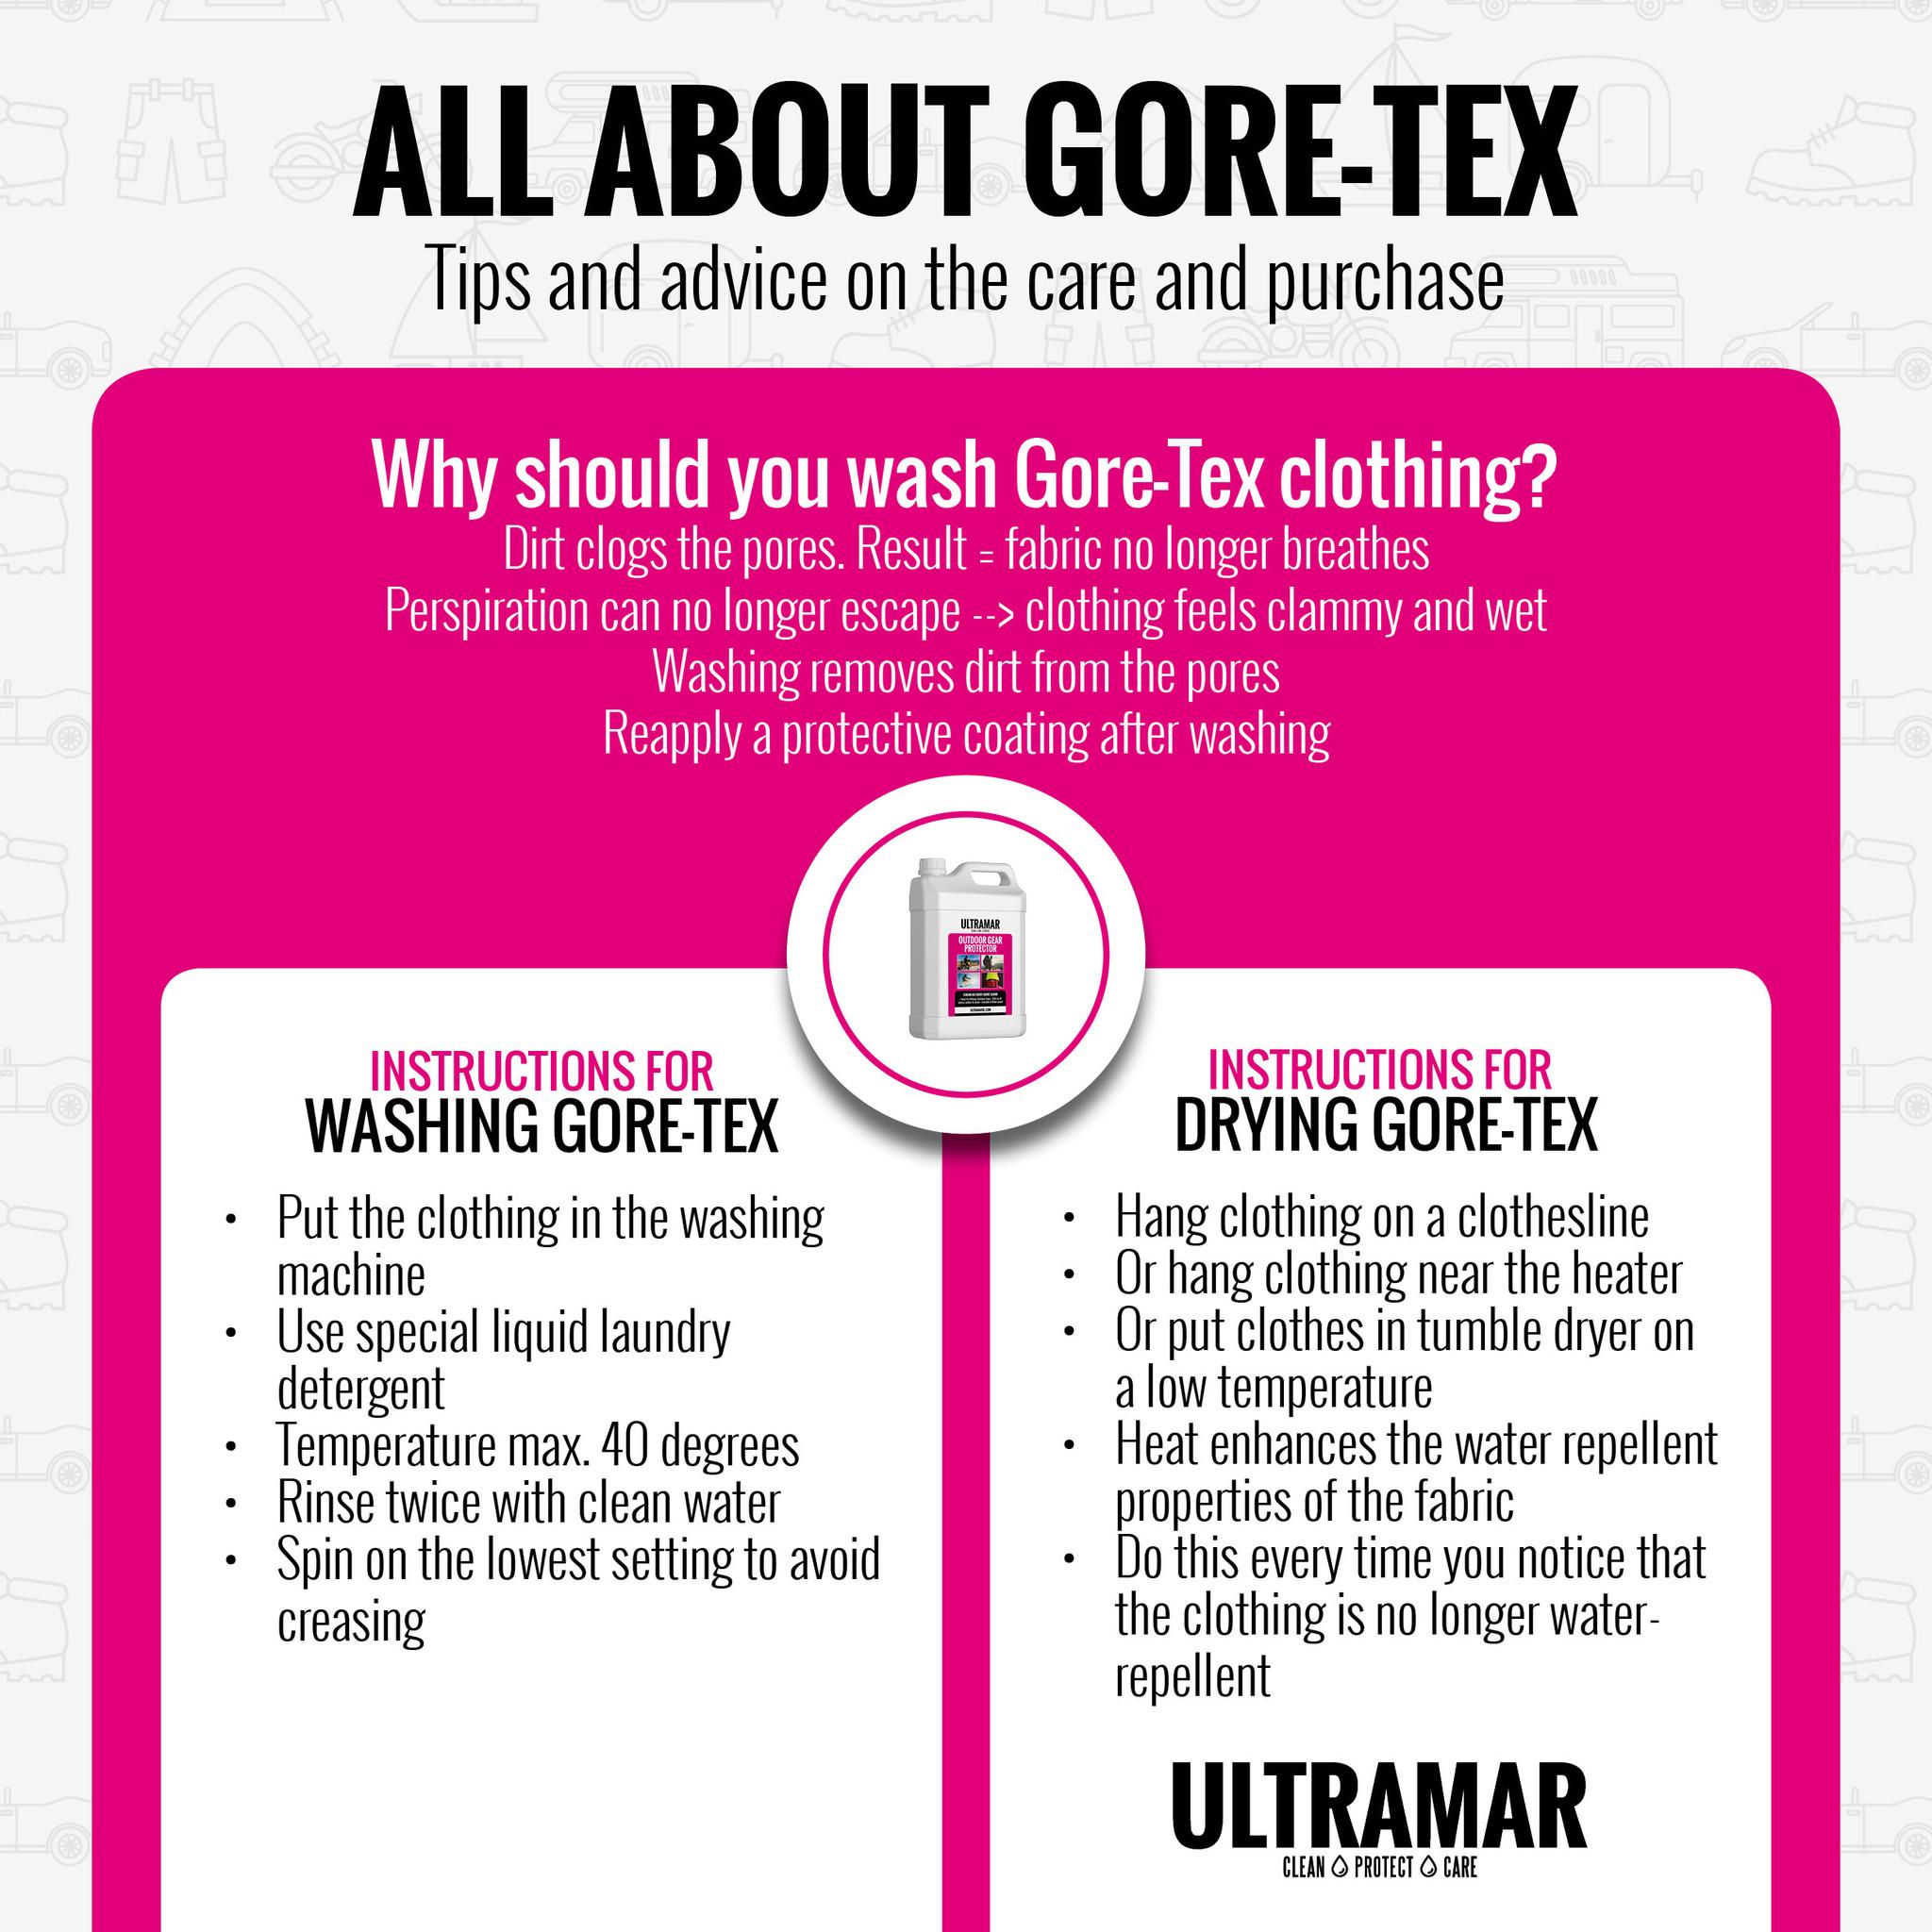 Wash Gore Tex